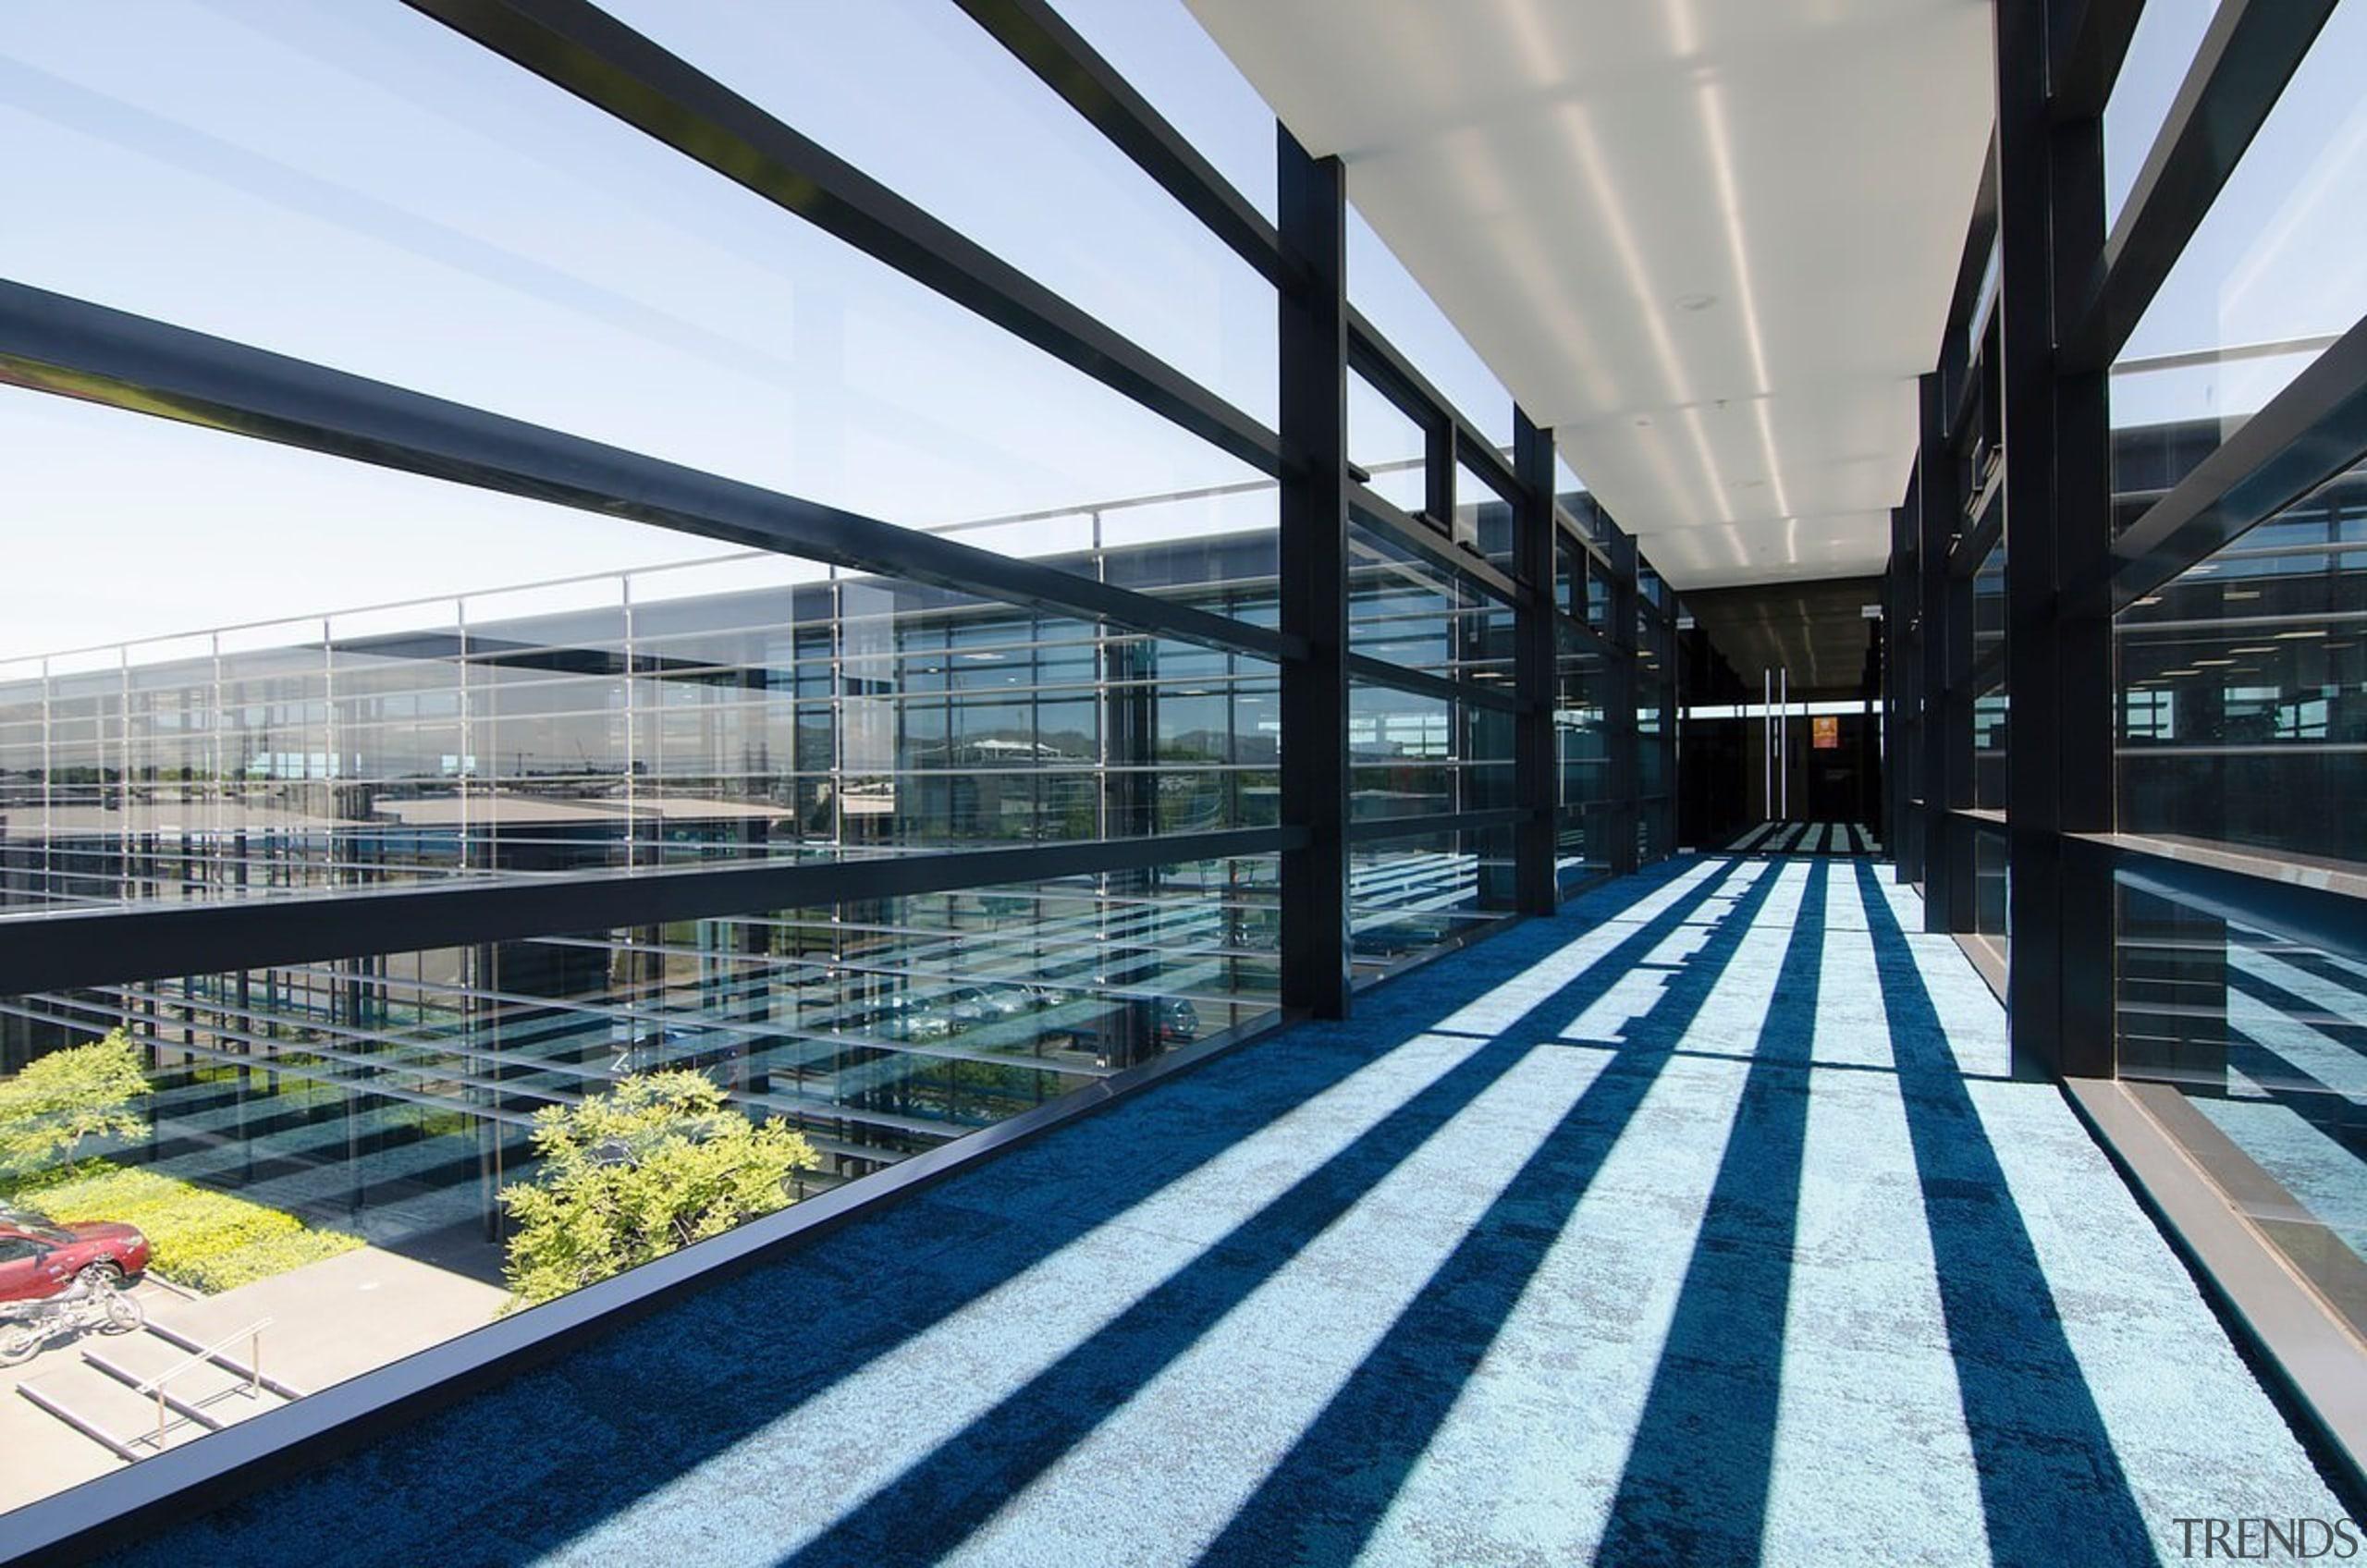 Airbridge - Airbridge - architecture | building | architecture, building, daylighting, metropolitan area, real estate, roof, structure, white